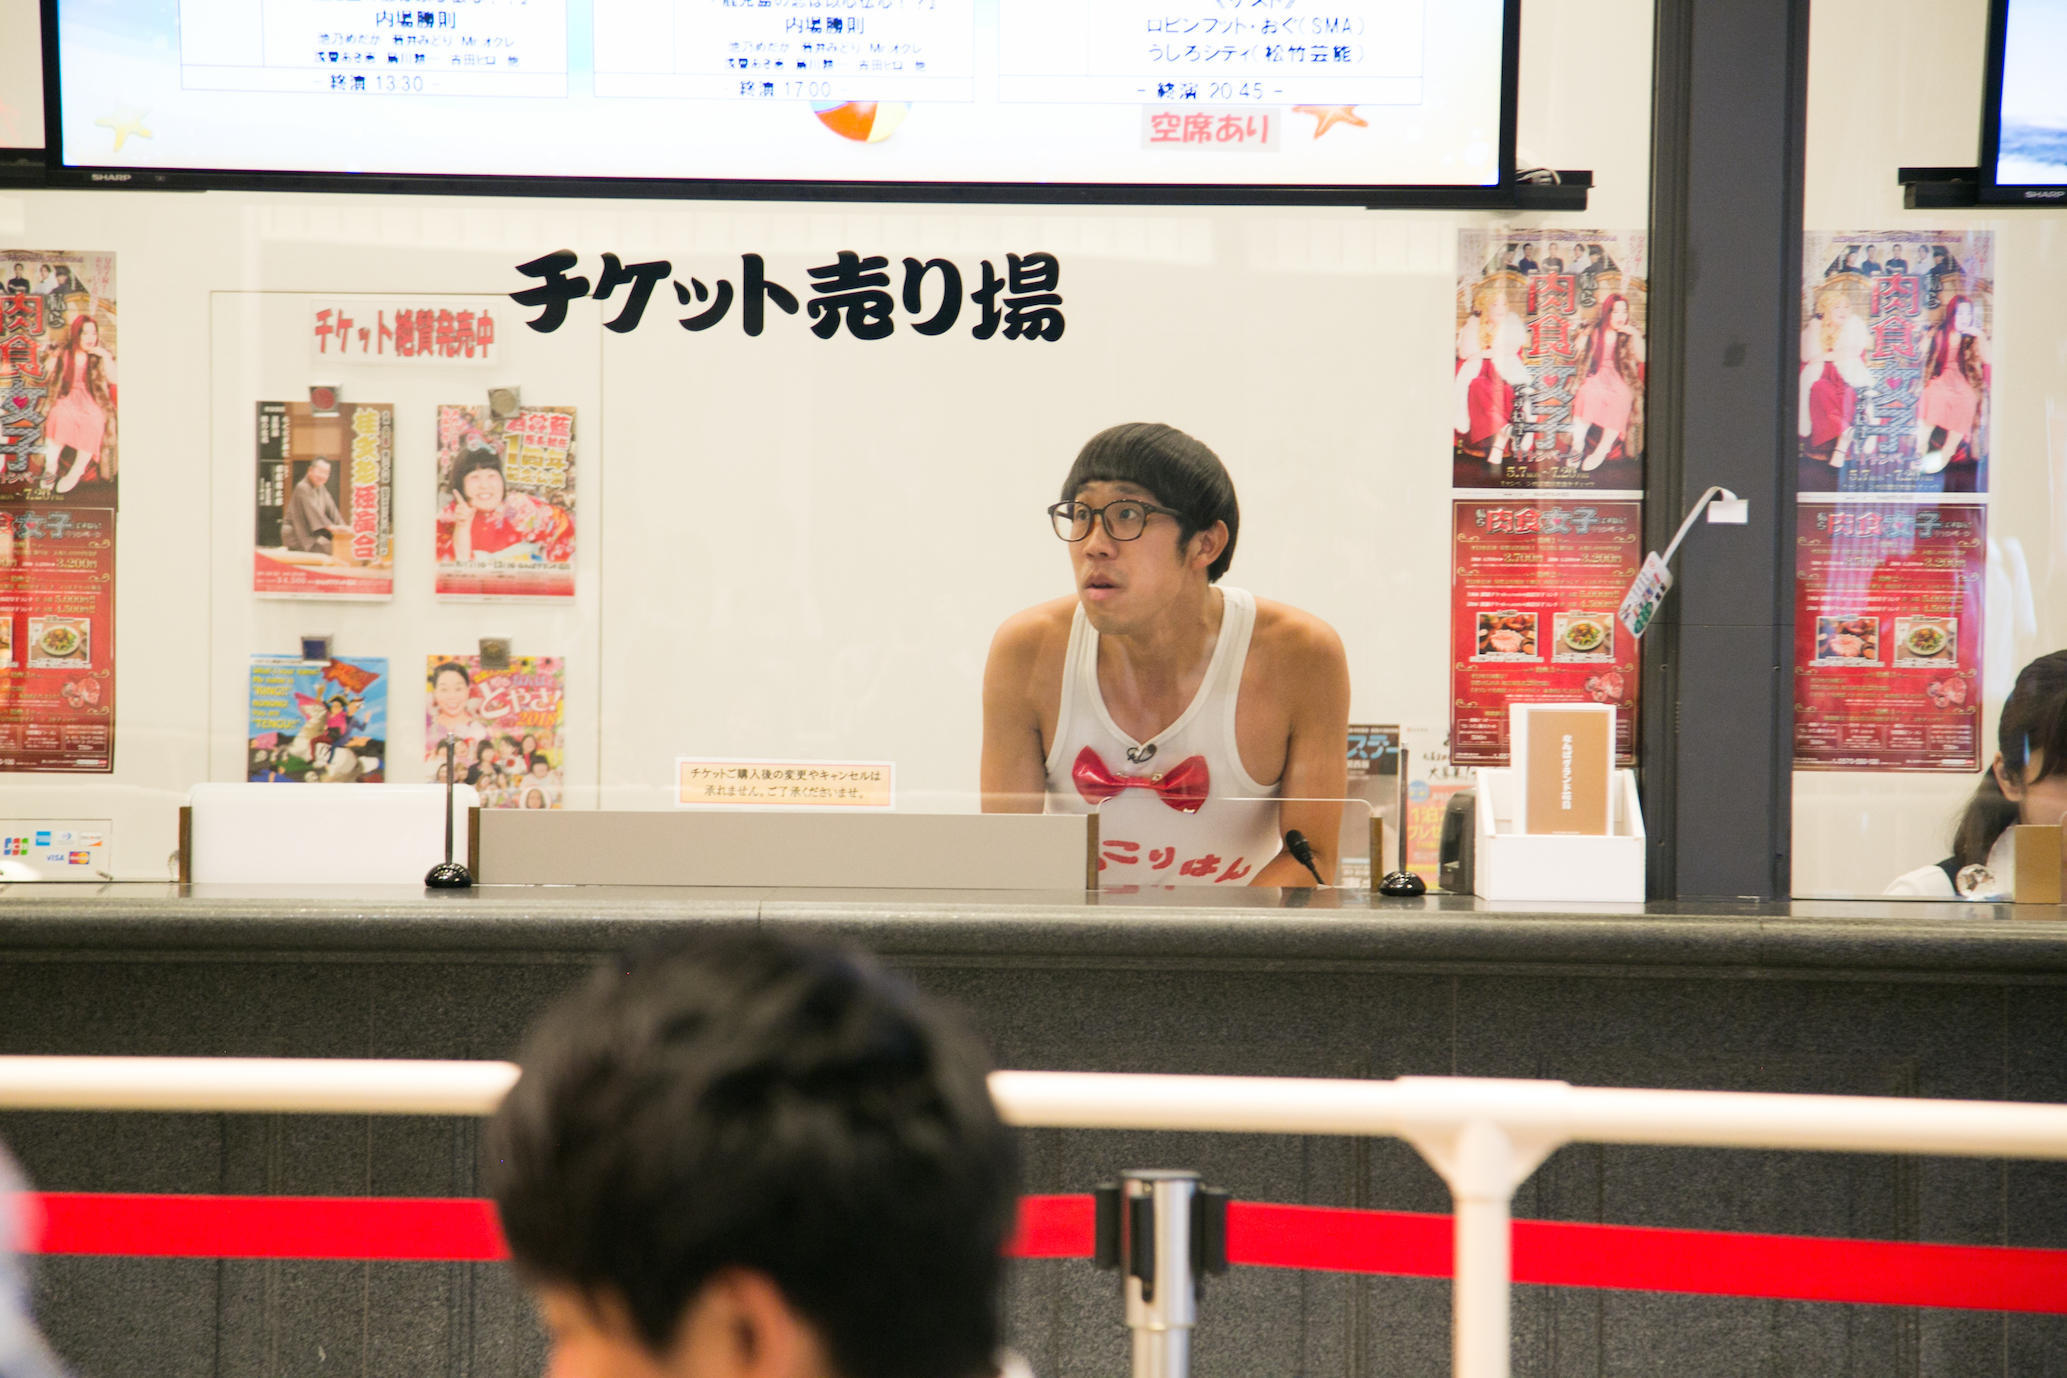 http://news.yoshimoto.co.jp/20180717223528-db8ba19c9771a5f6c88005cef22d060185c8378a.jpg